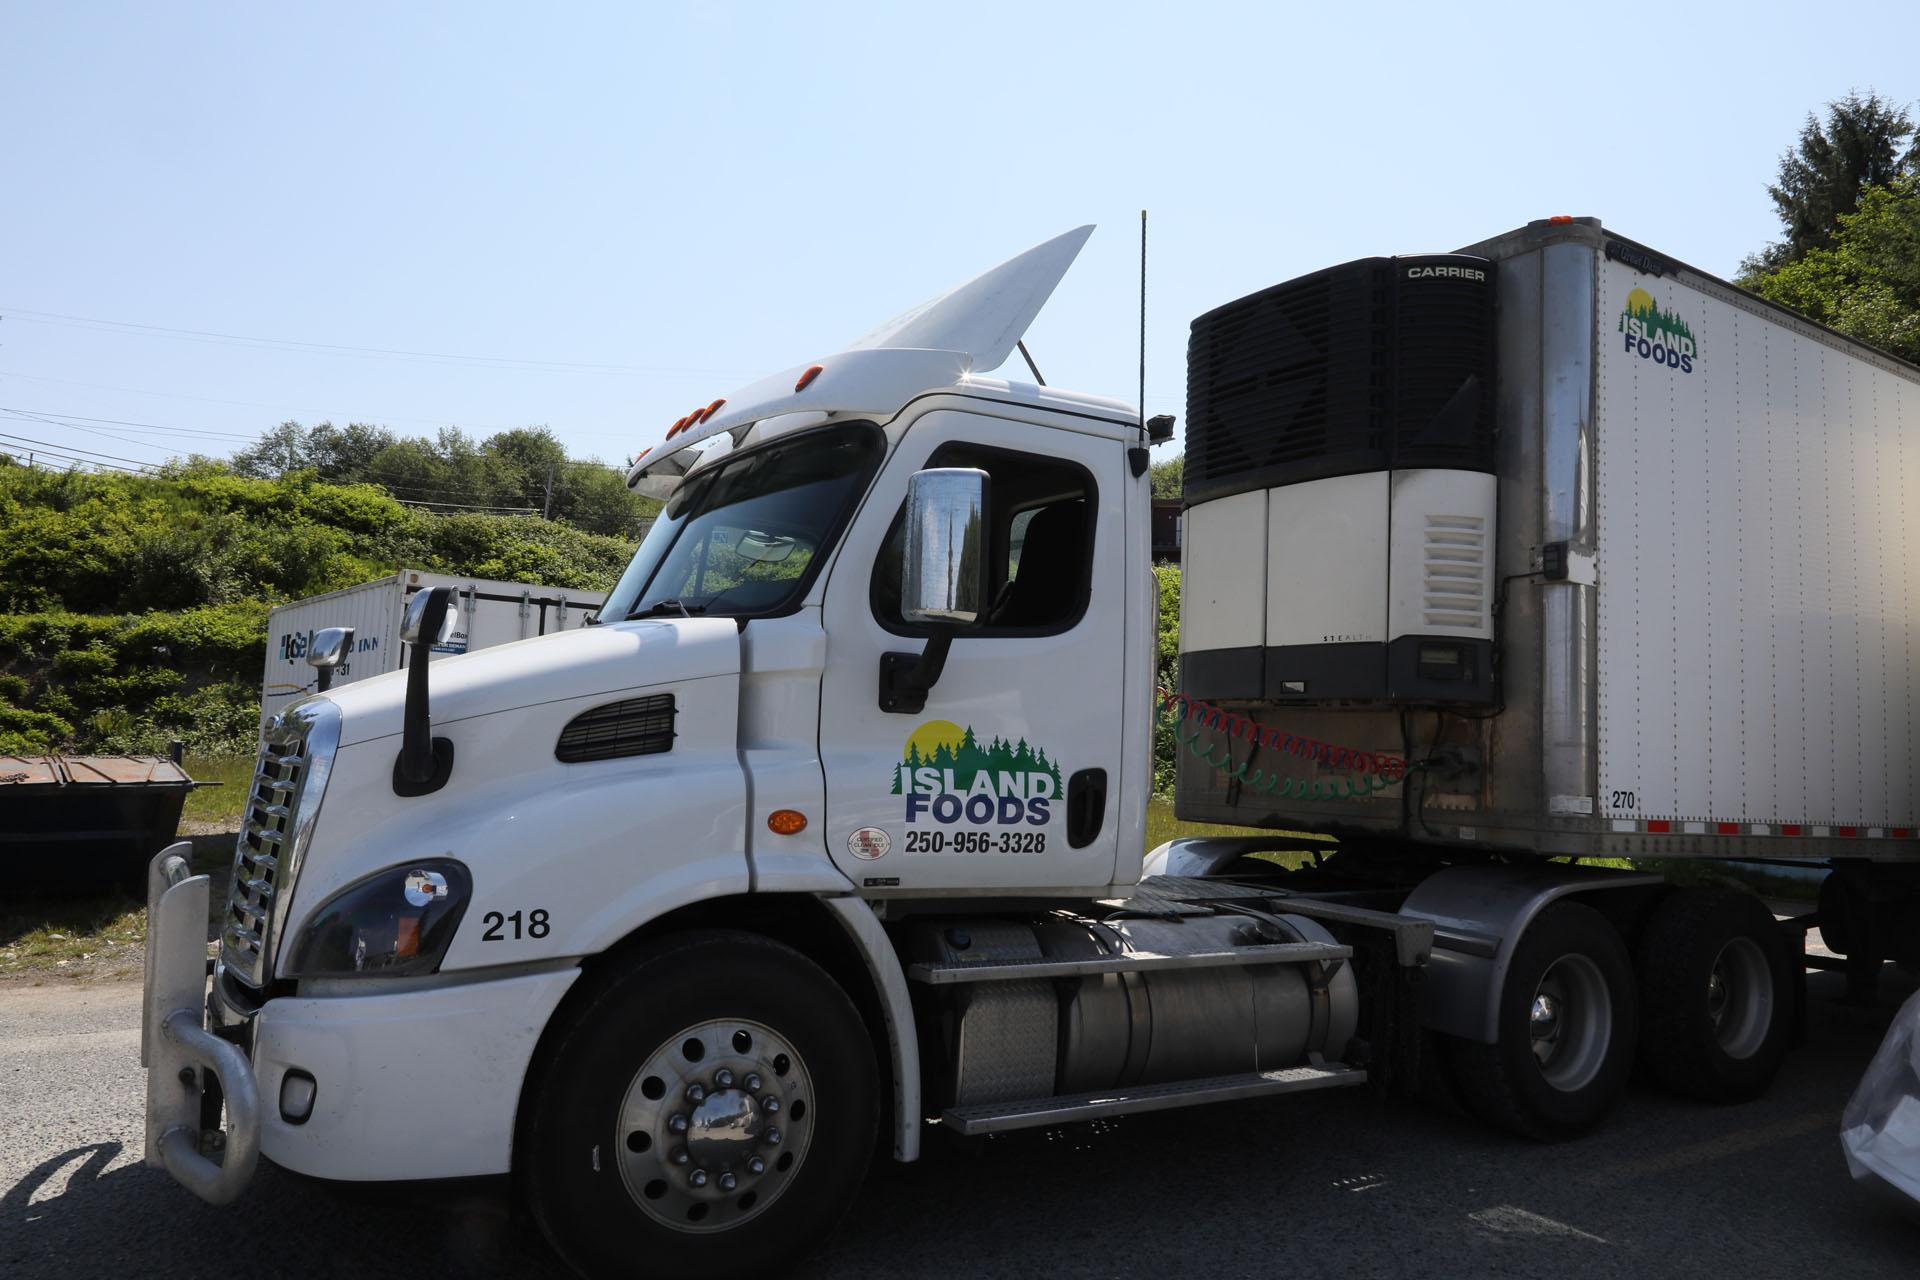 Refrigerated food transport truck - Island Foods